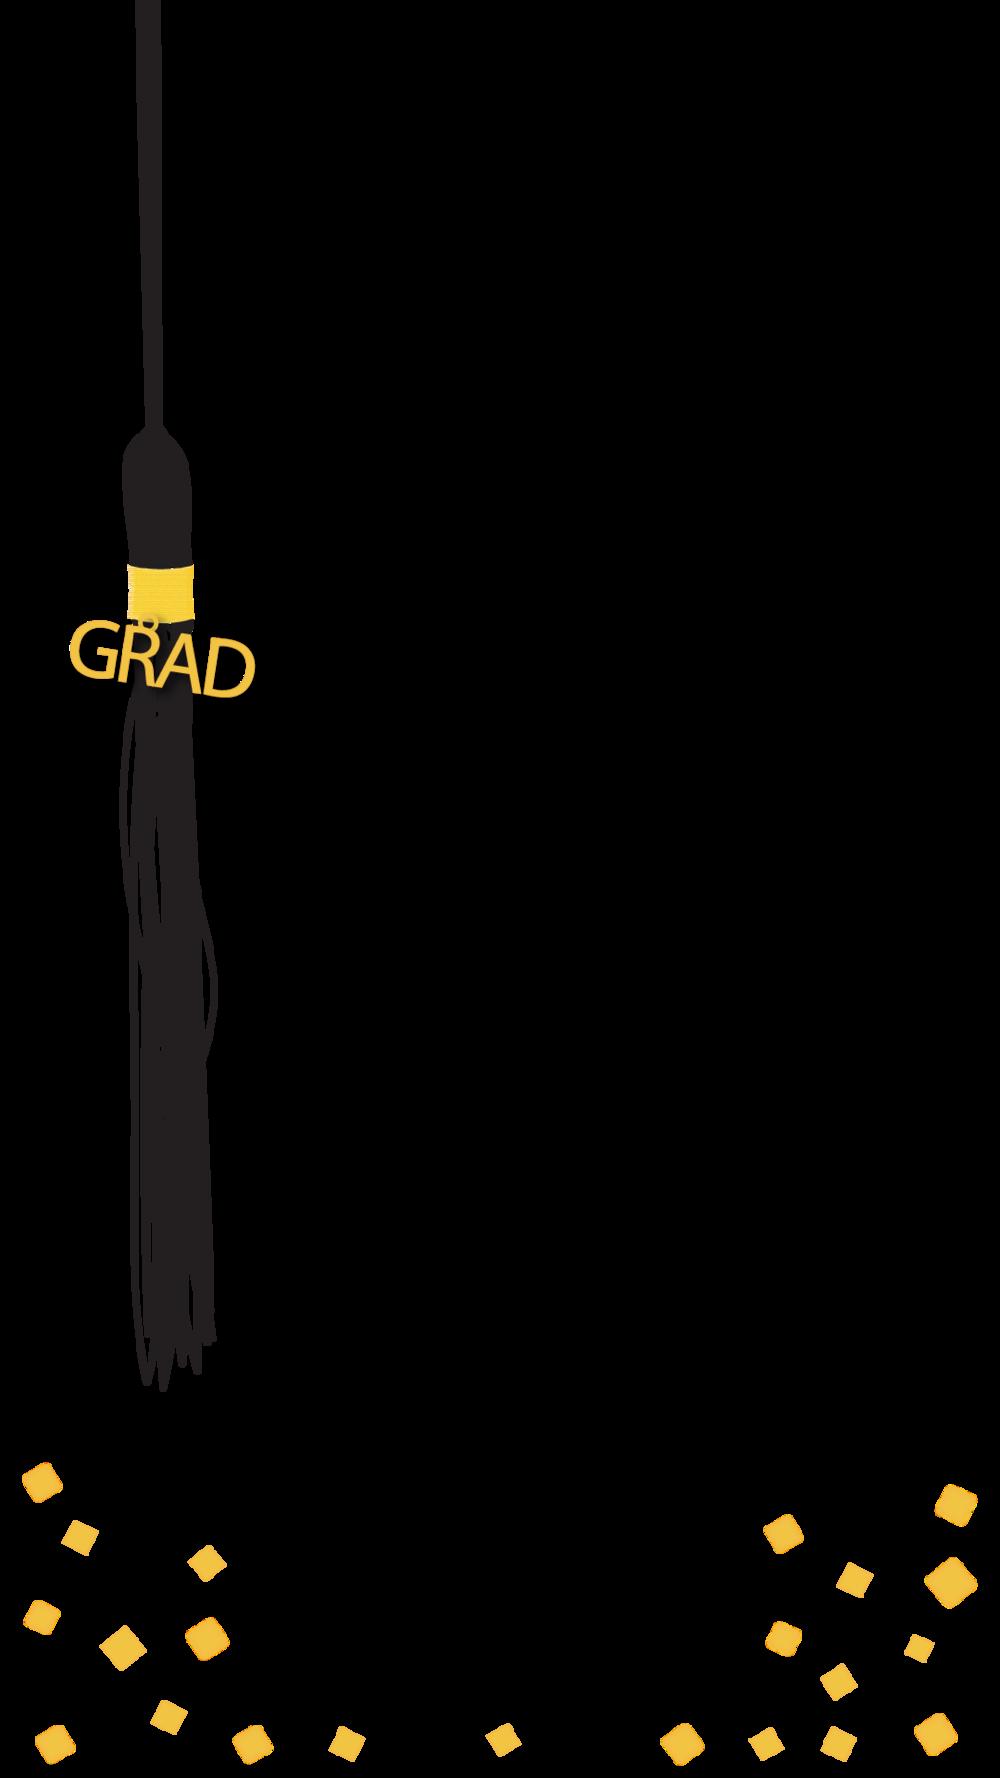 Grad Geofilter.png